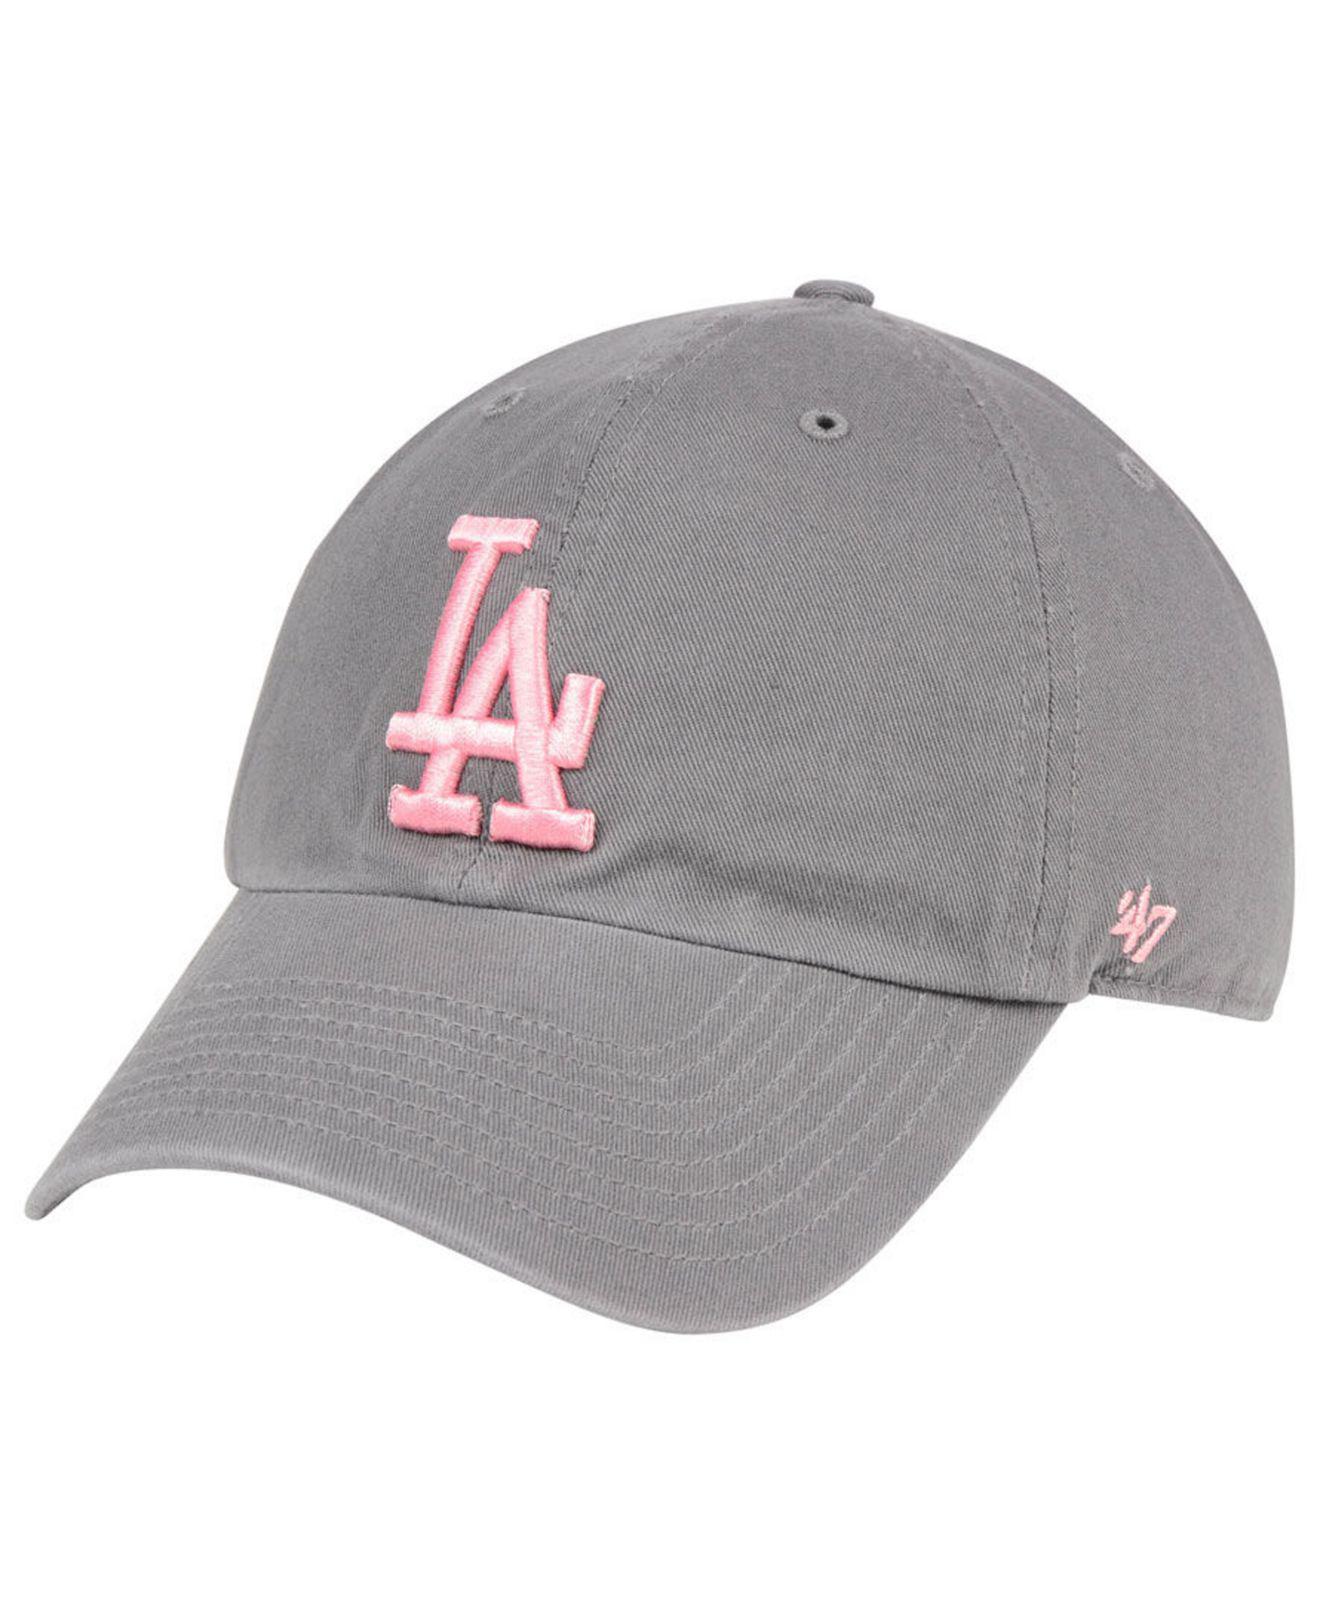 best website 0995c 0ada8 ... france 47 brand. womens los angeles dodgers dark gray pink clean up cap  965d2 8461d